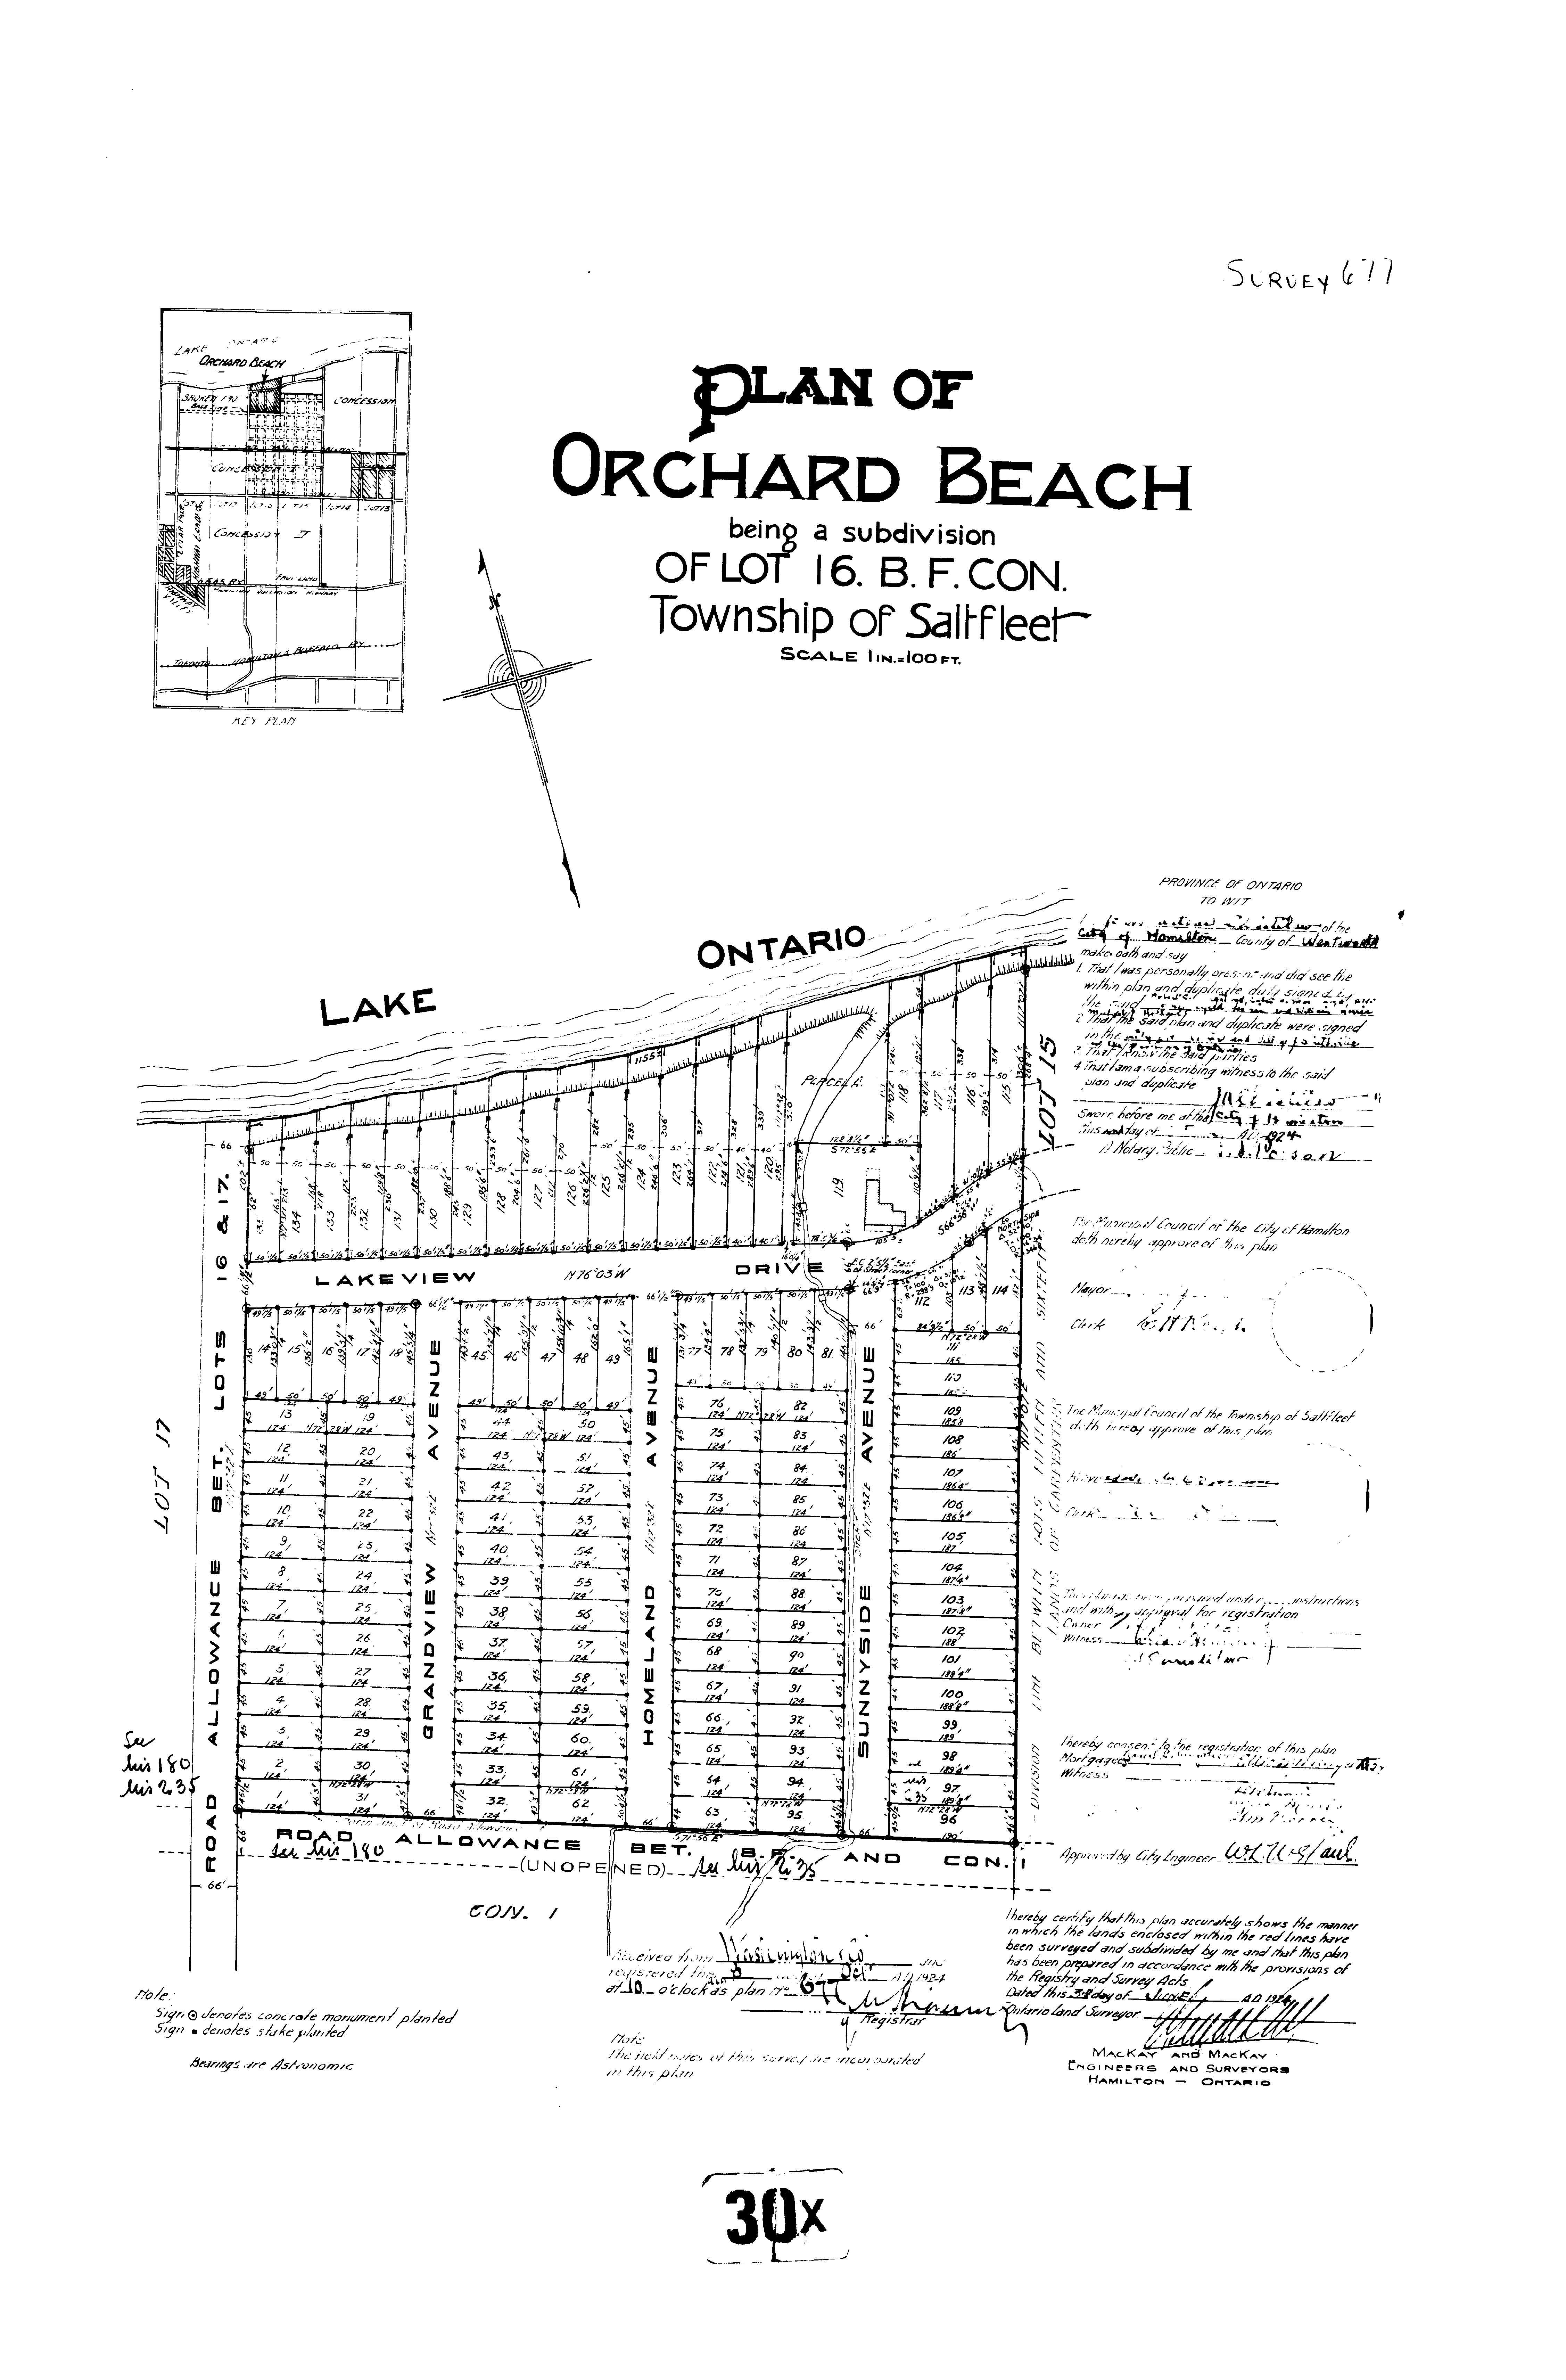 2 Lakeview plan.jpg